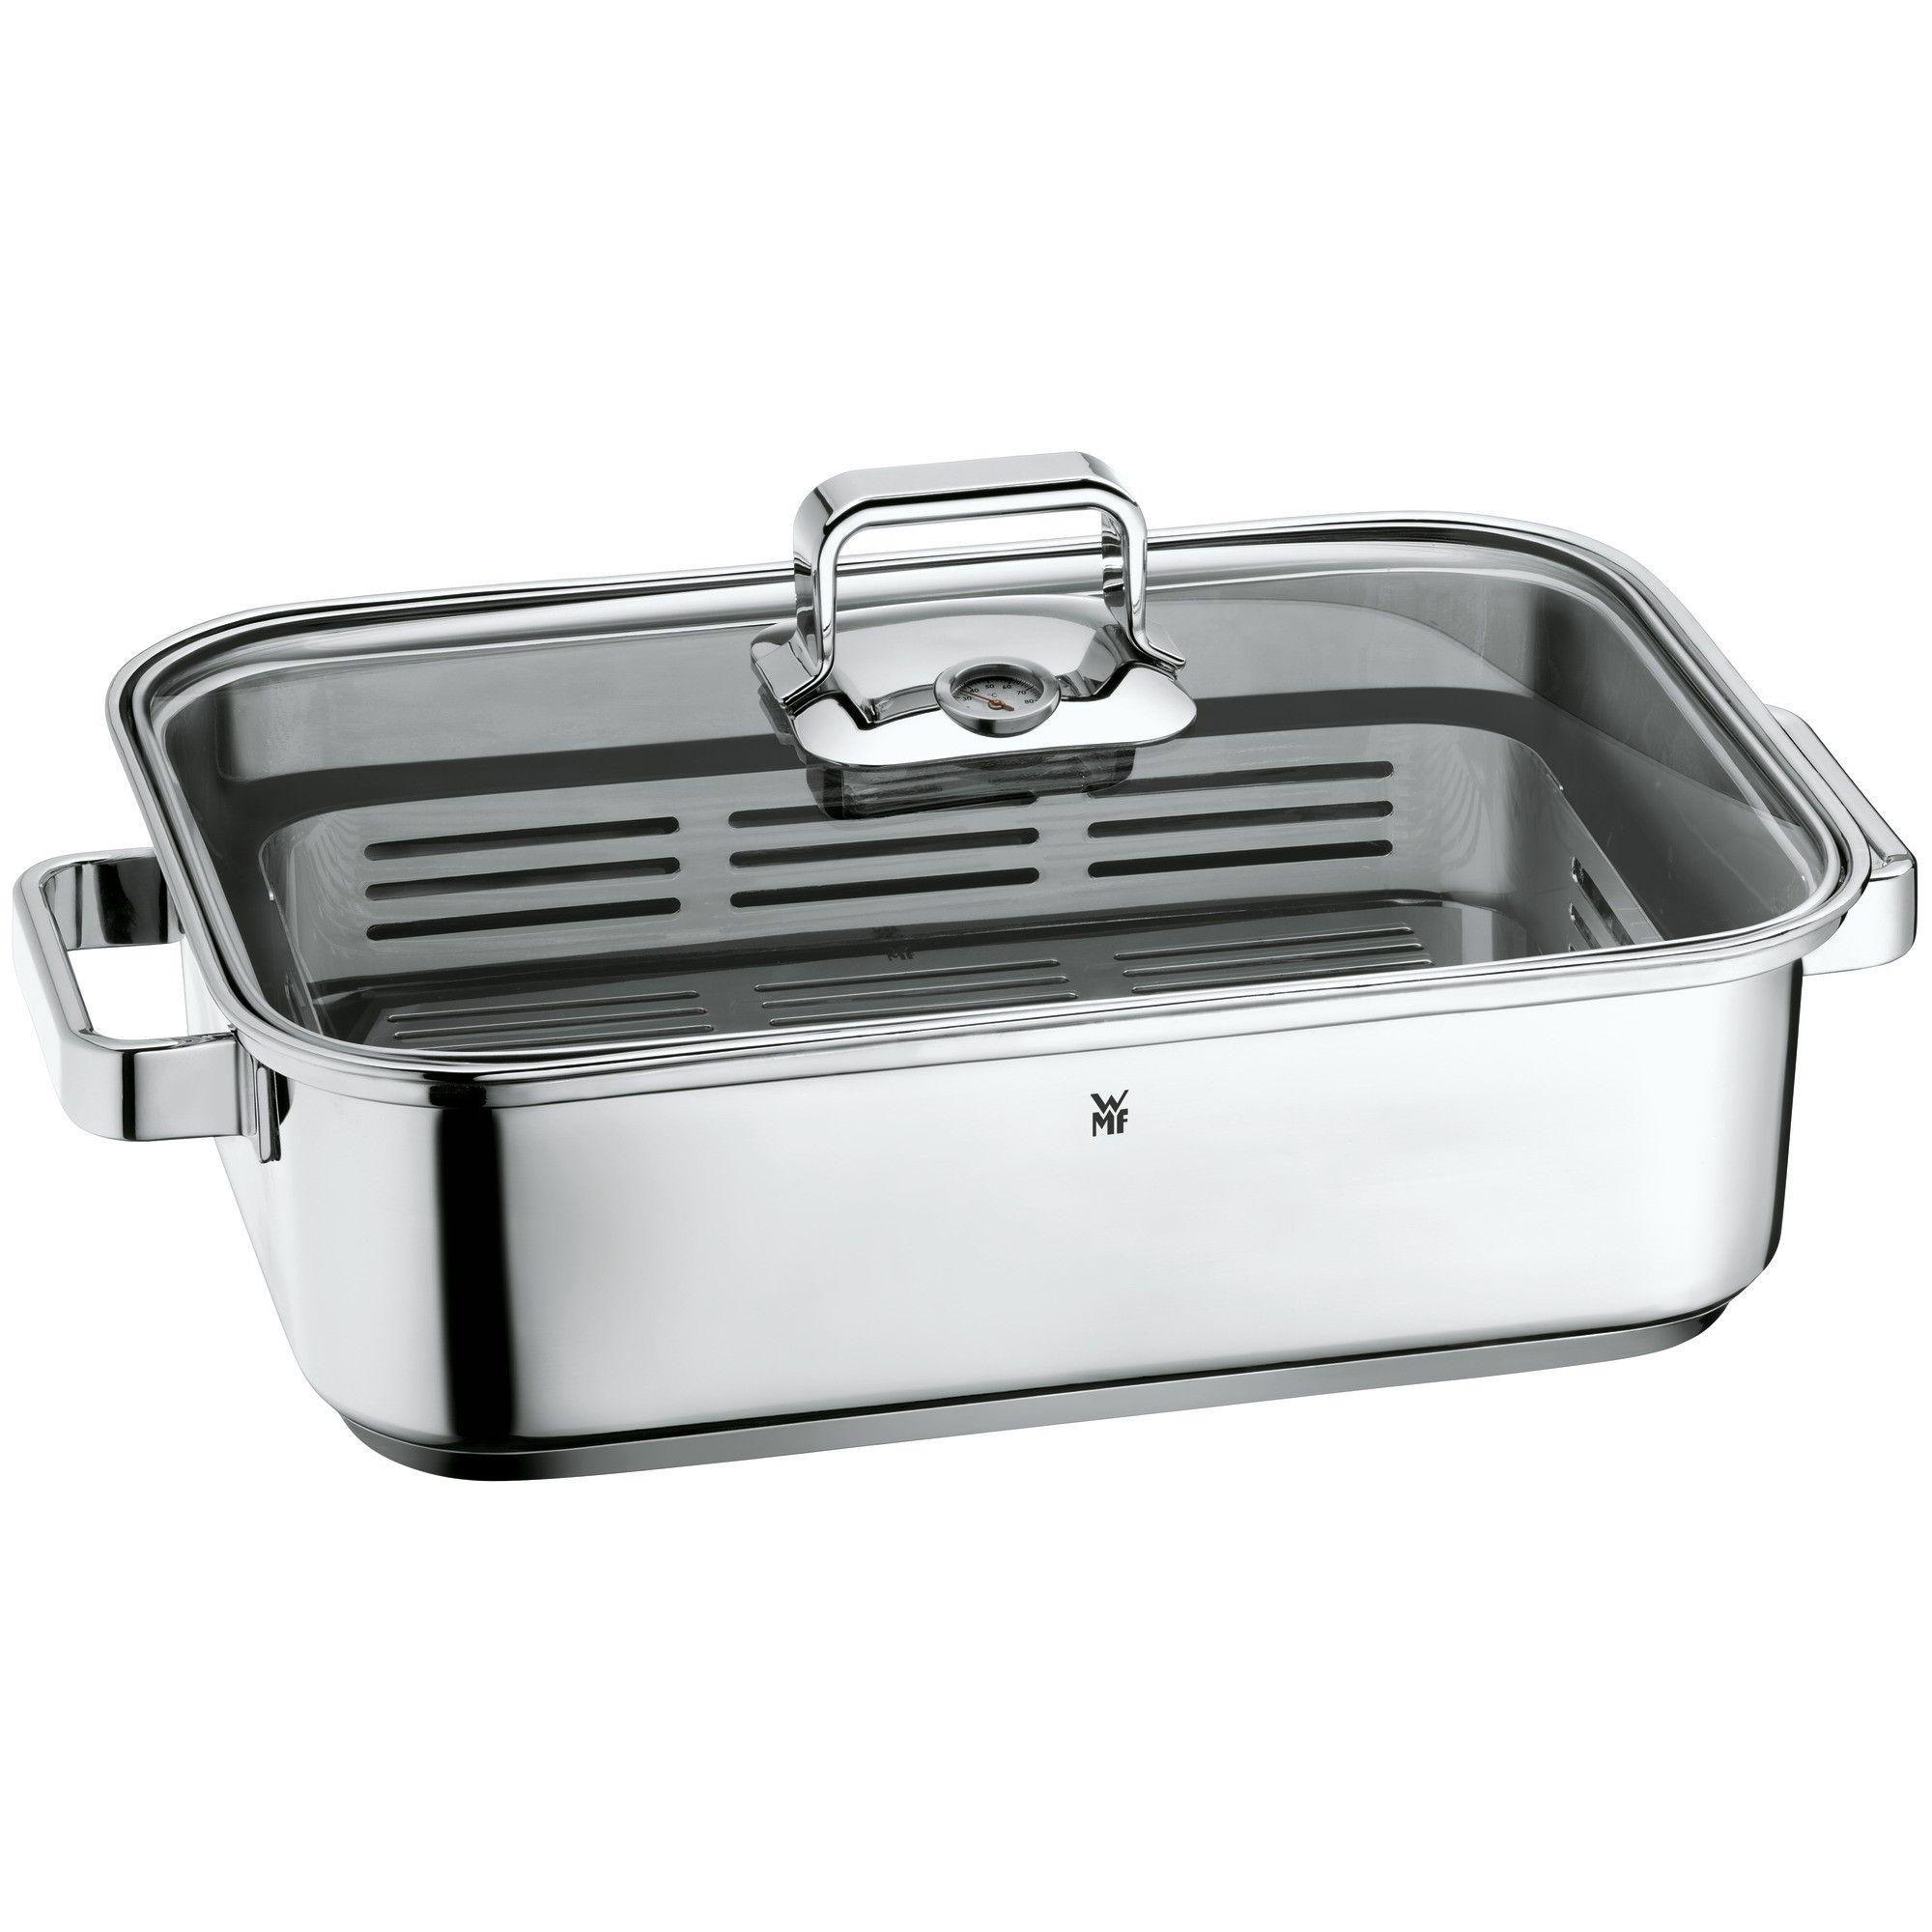 WMF LONO Toaster 0414090011 Cromargan